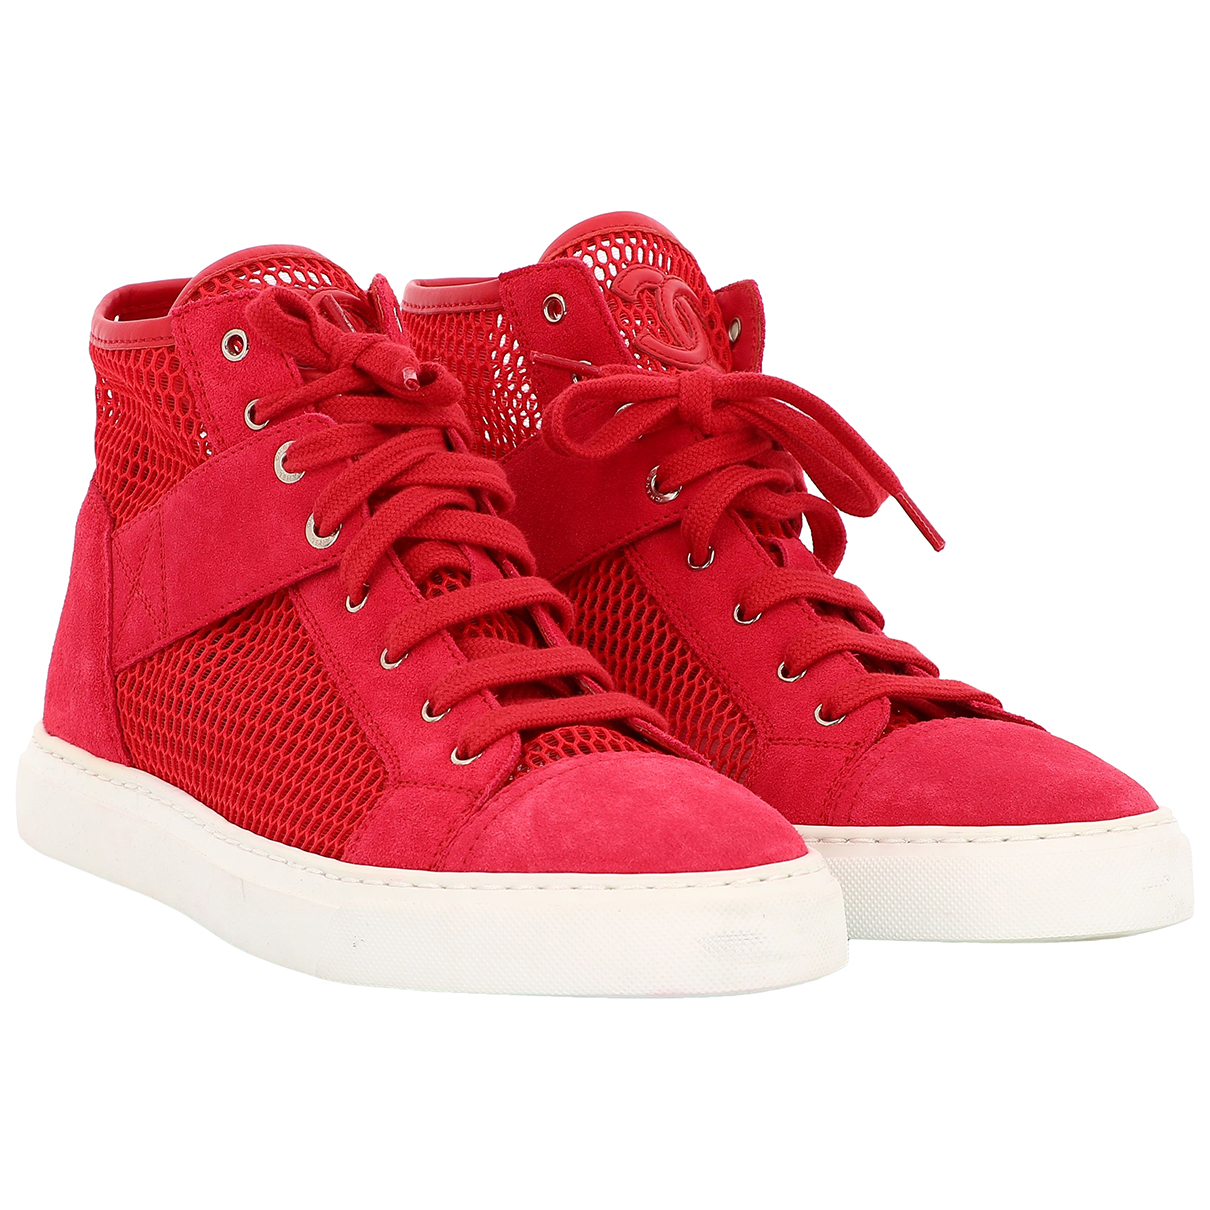 Chanel \N Sneakers in  Rot Veloursleder